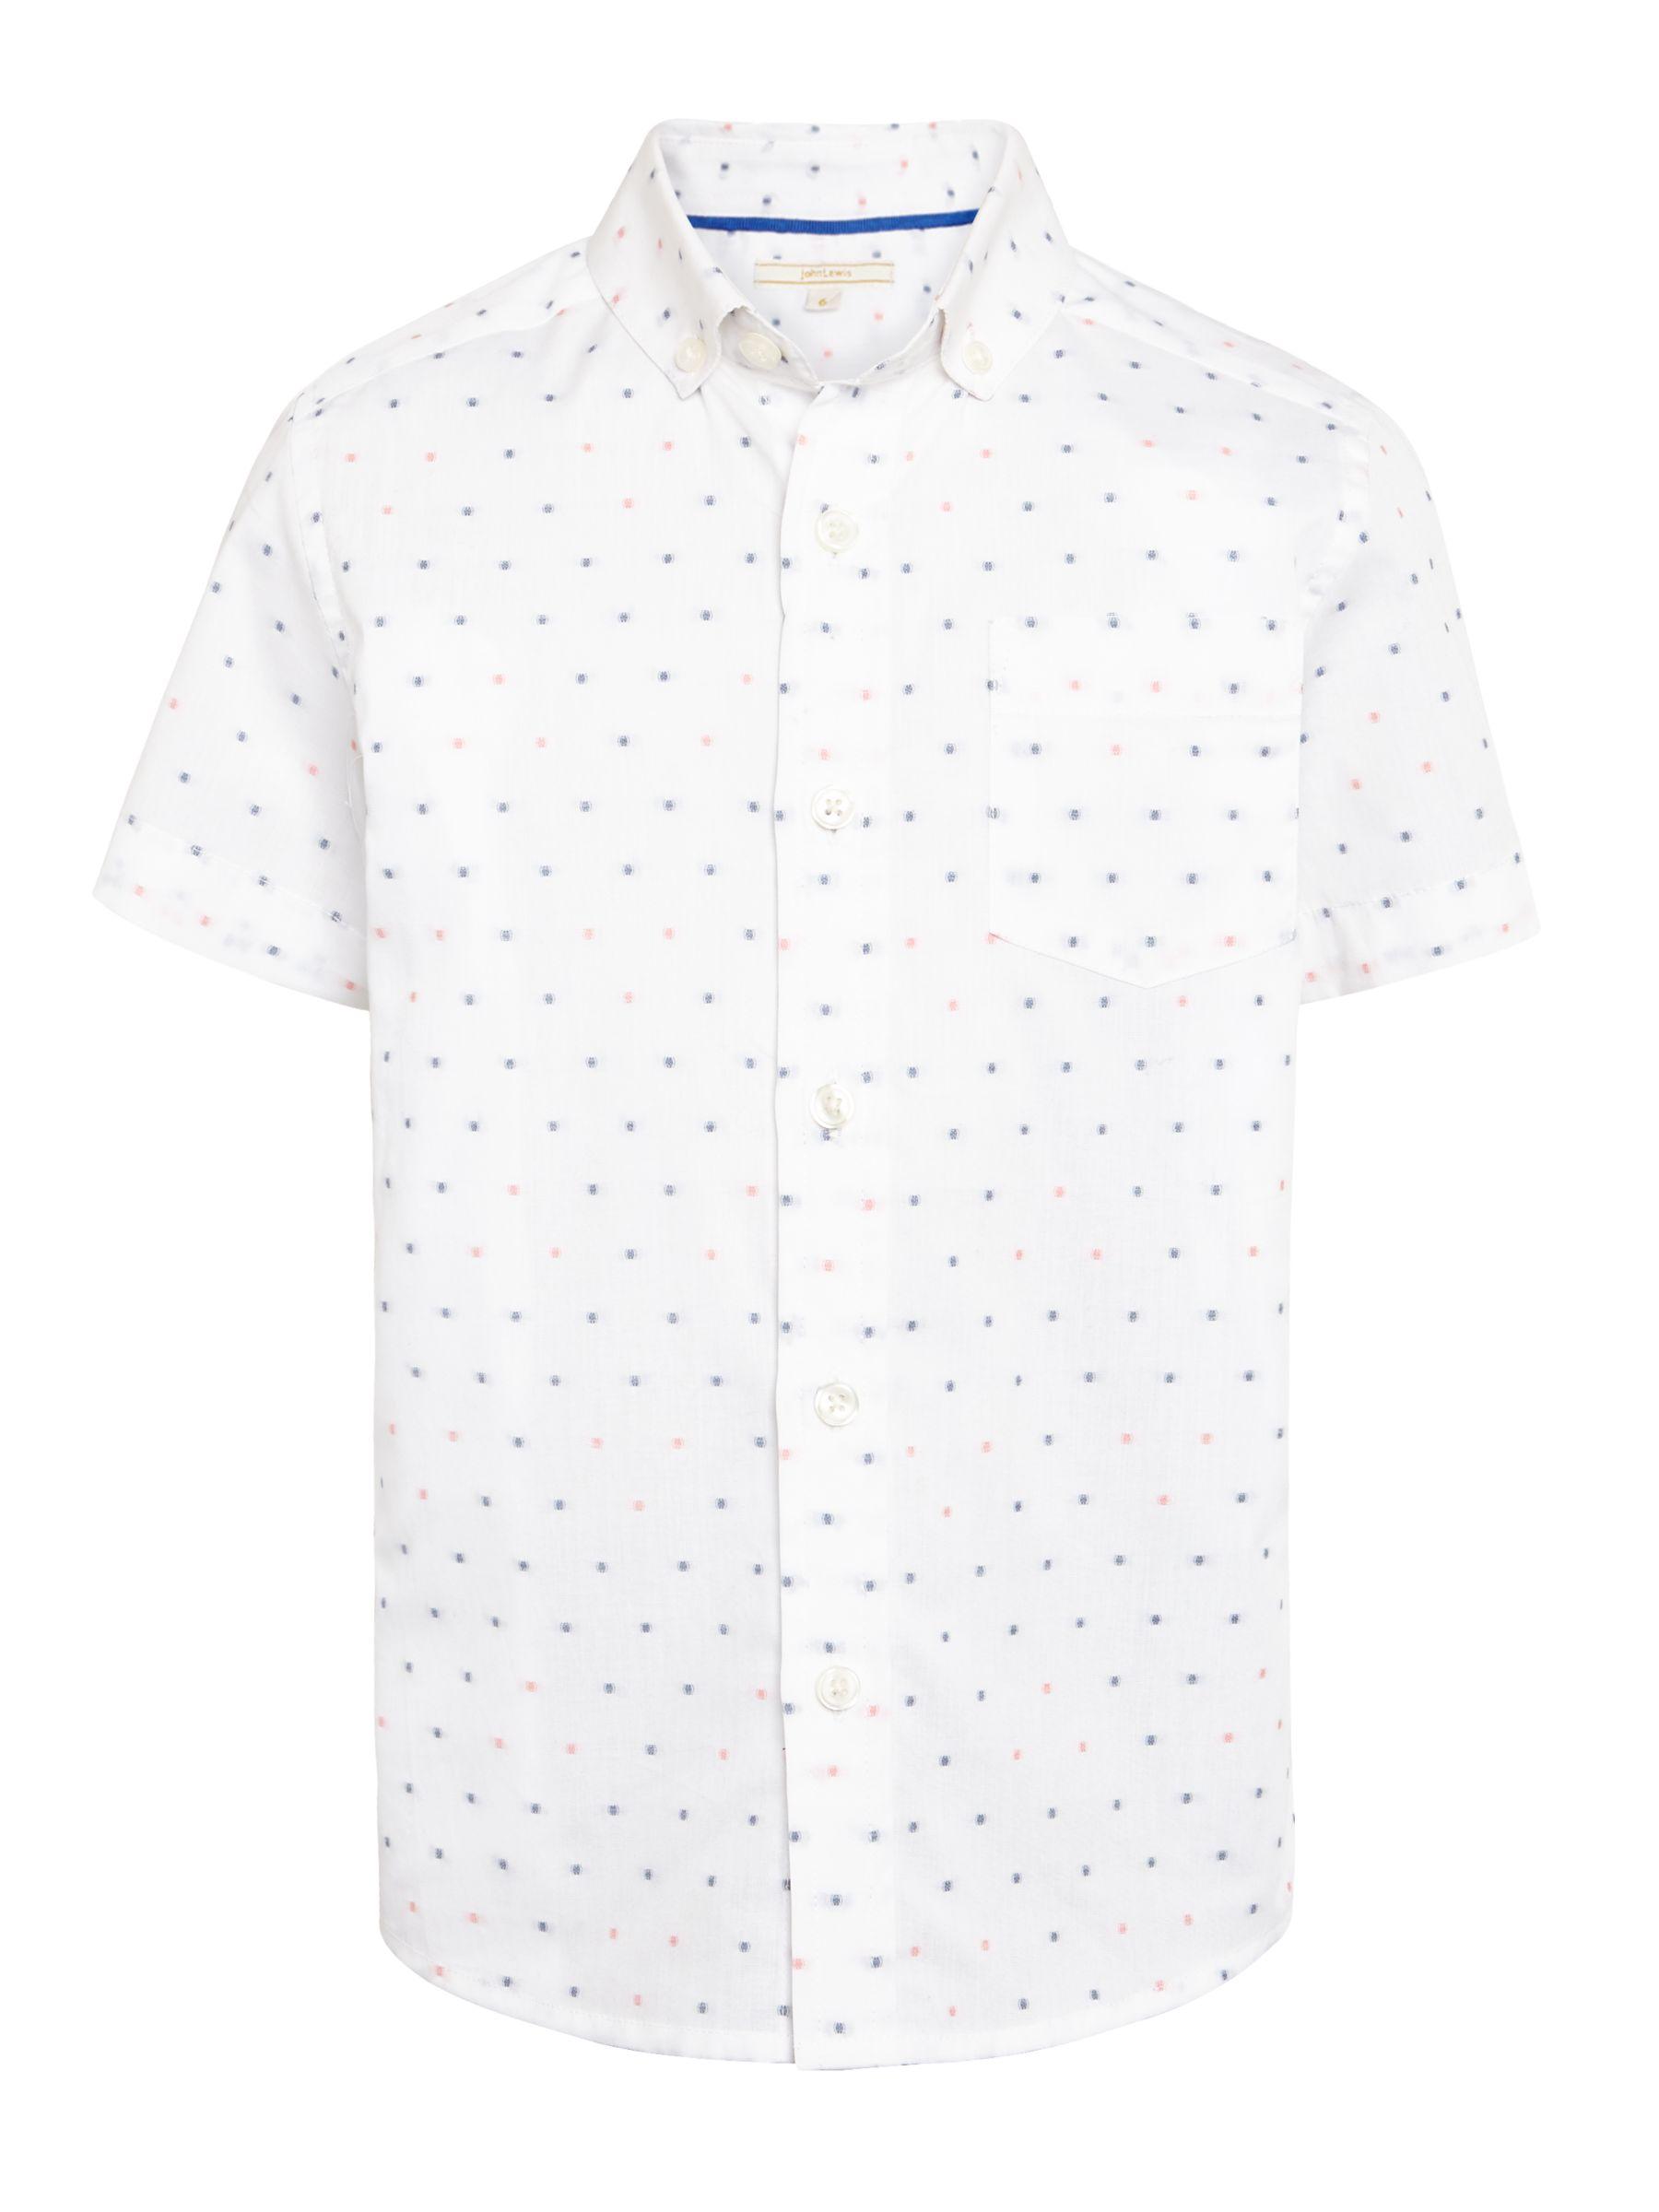 John Lewis Heirloom Collection John Lewis Heirloom Collection Boys' Short Sleeve Spot Shirt, White